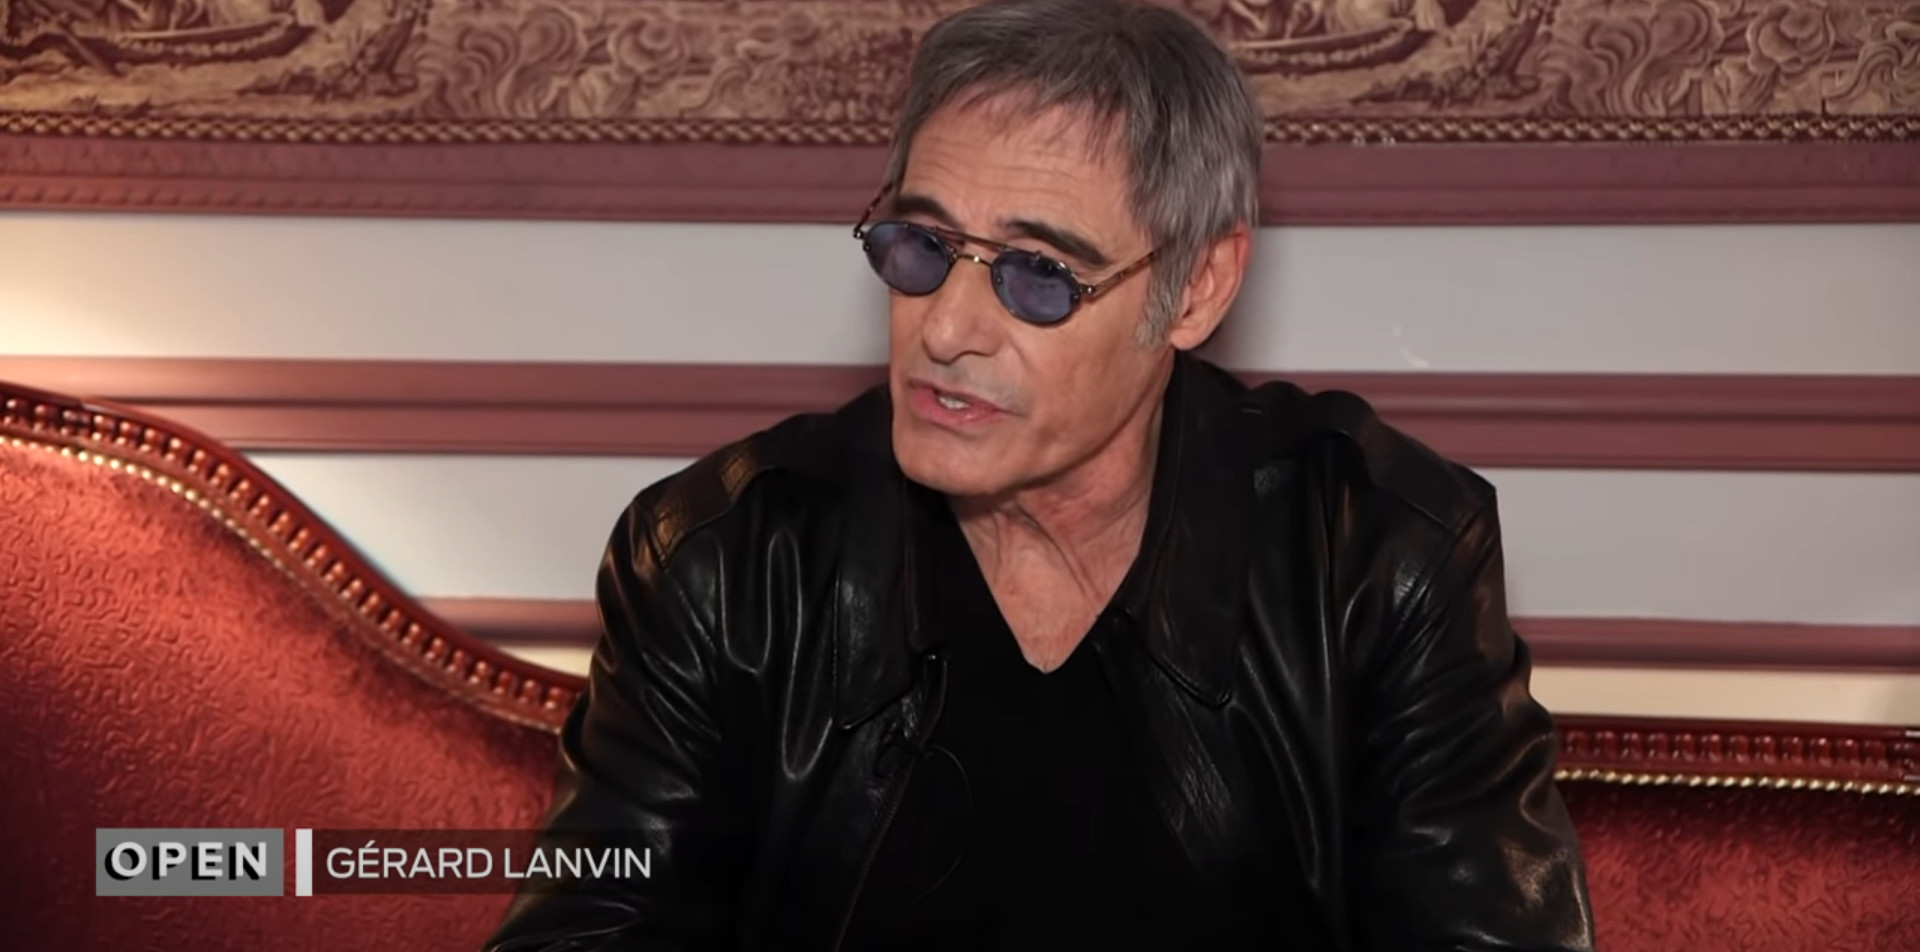 Open - Gérard Lanvin